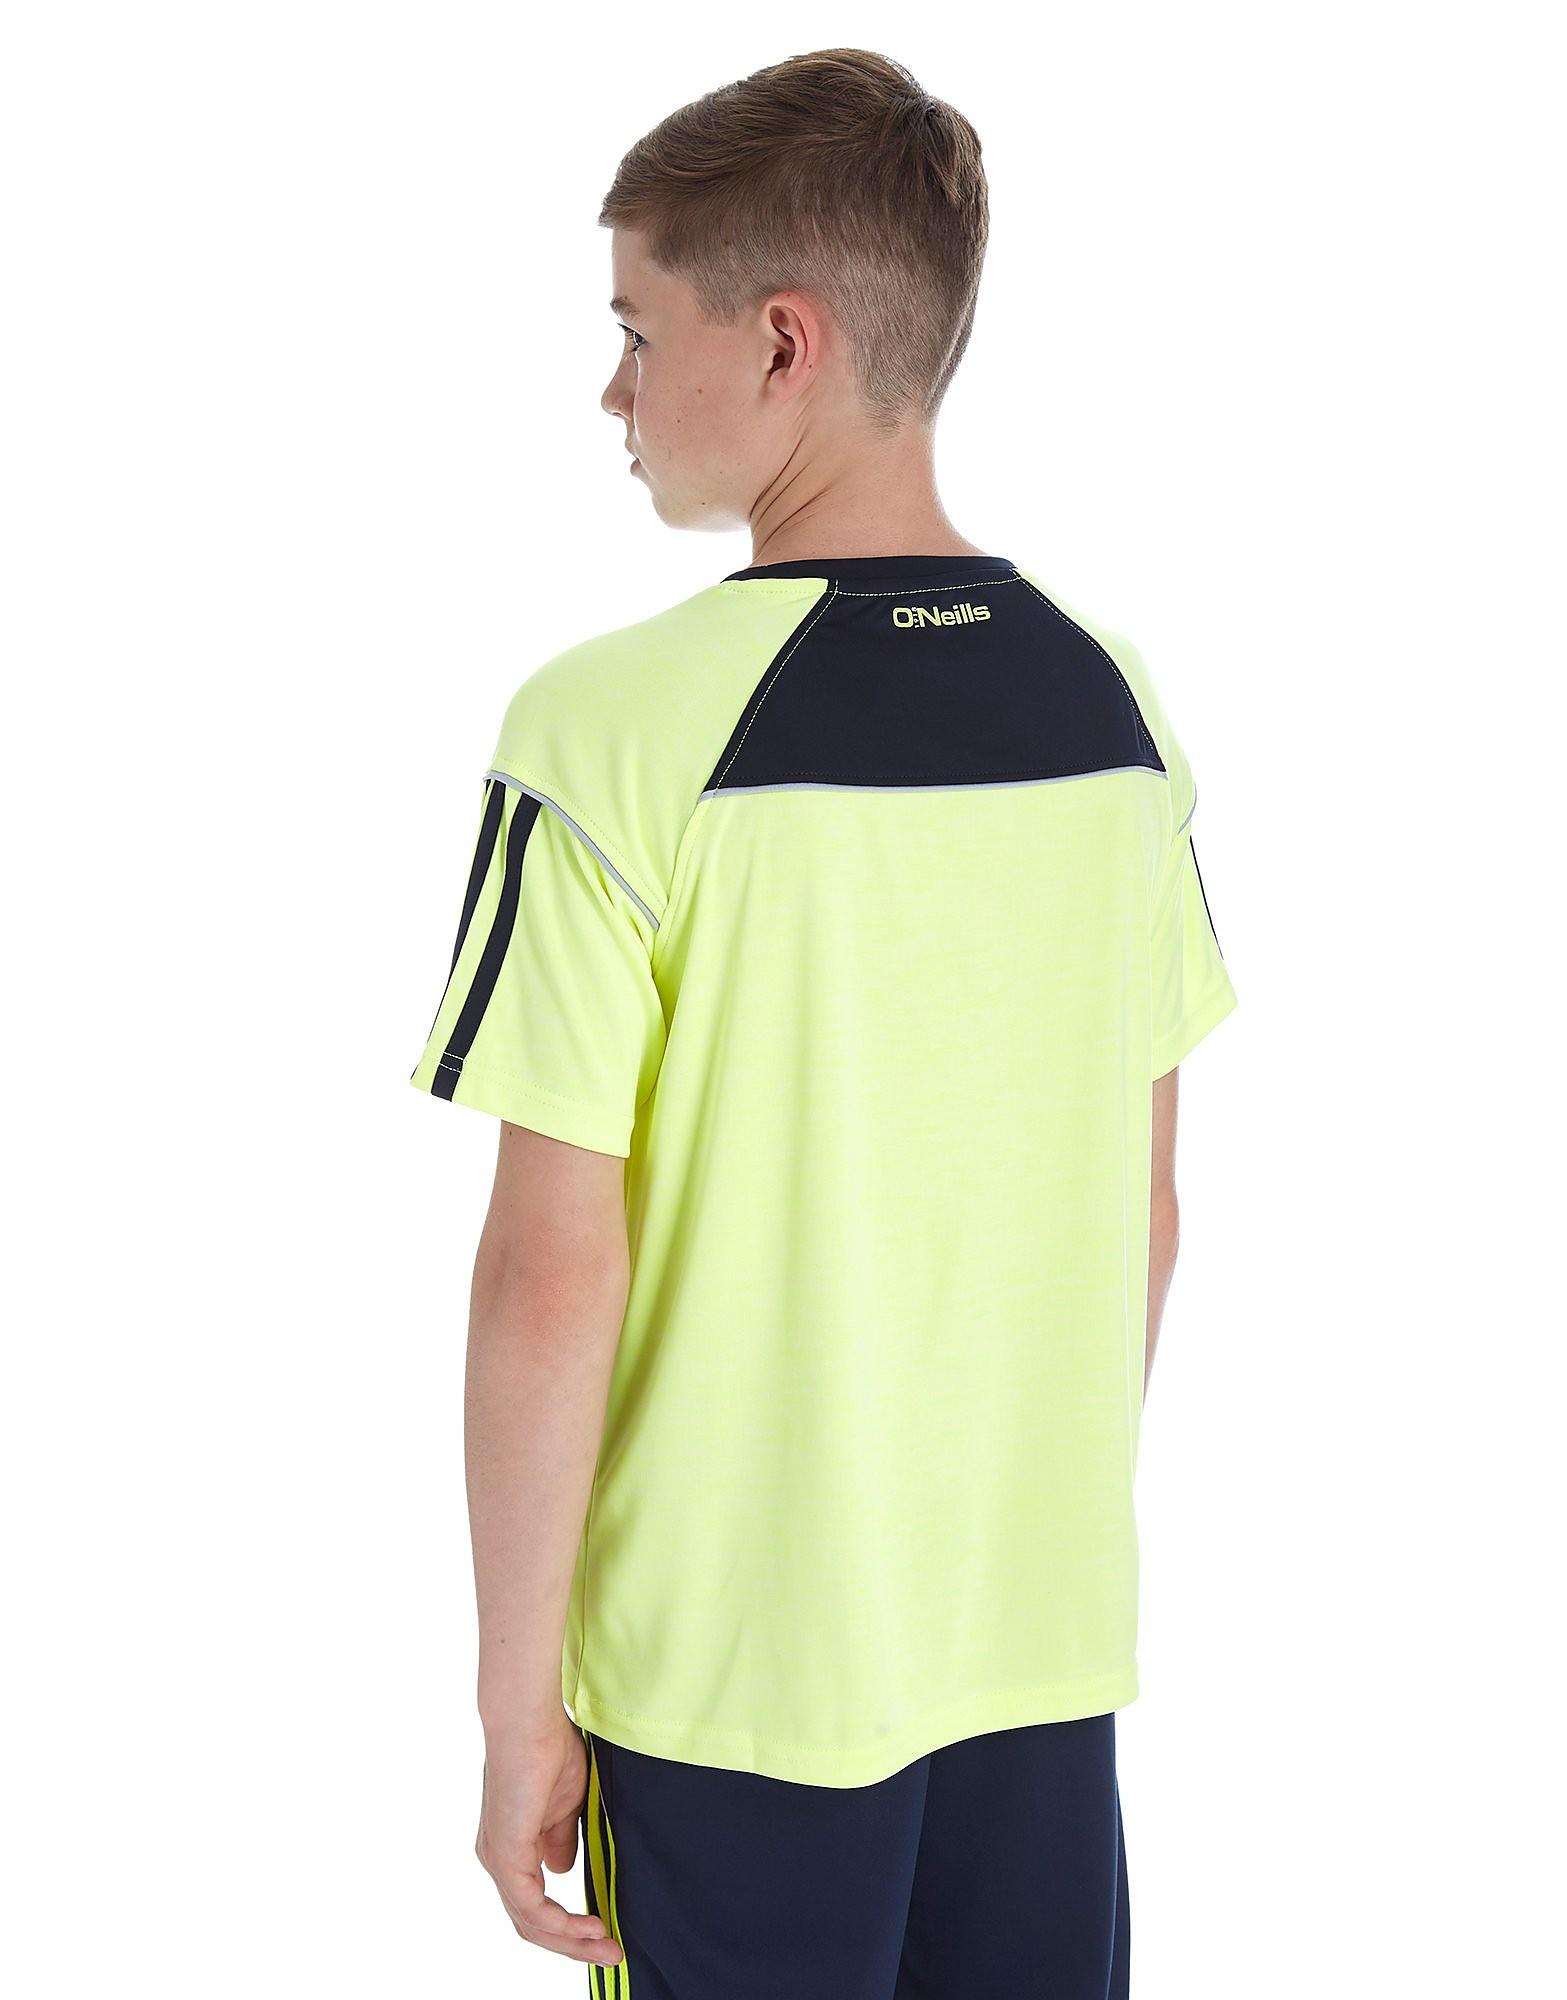 O'Neills Kilkenny GAA T-Shirt